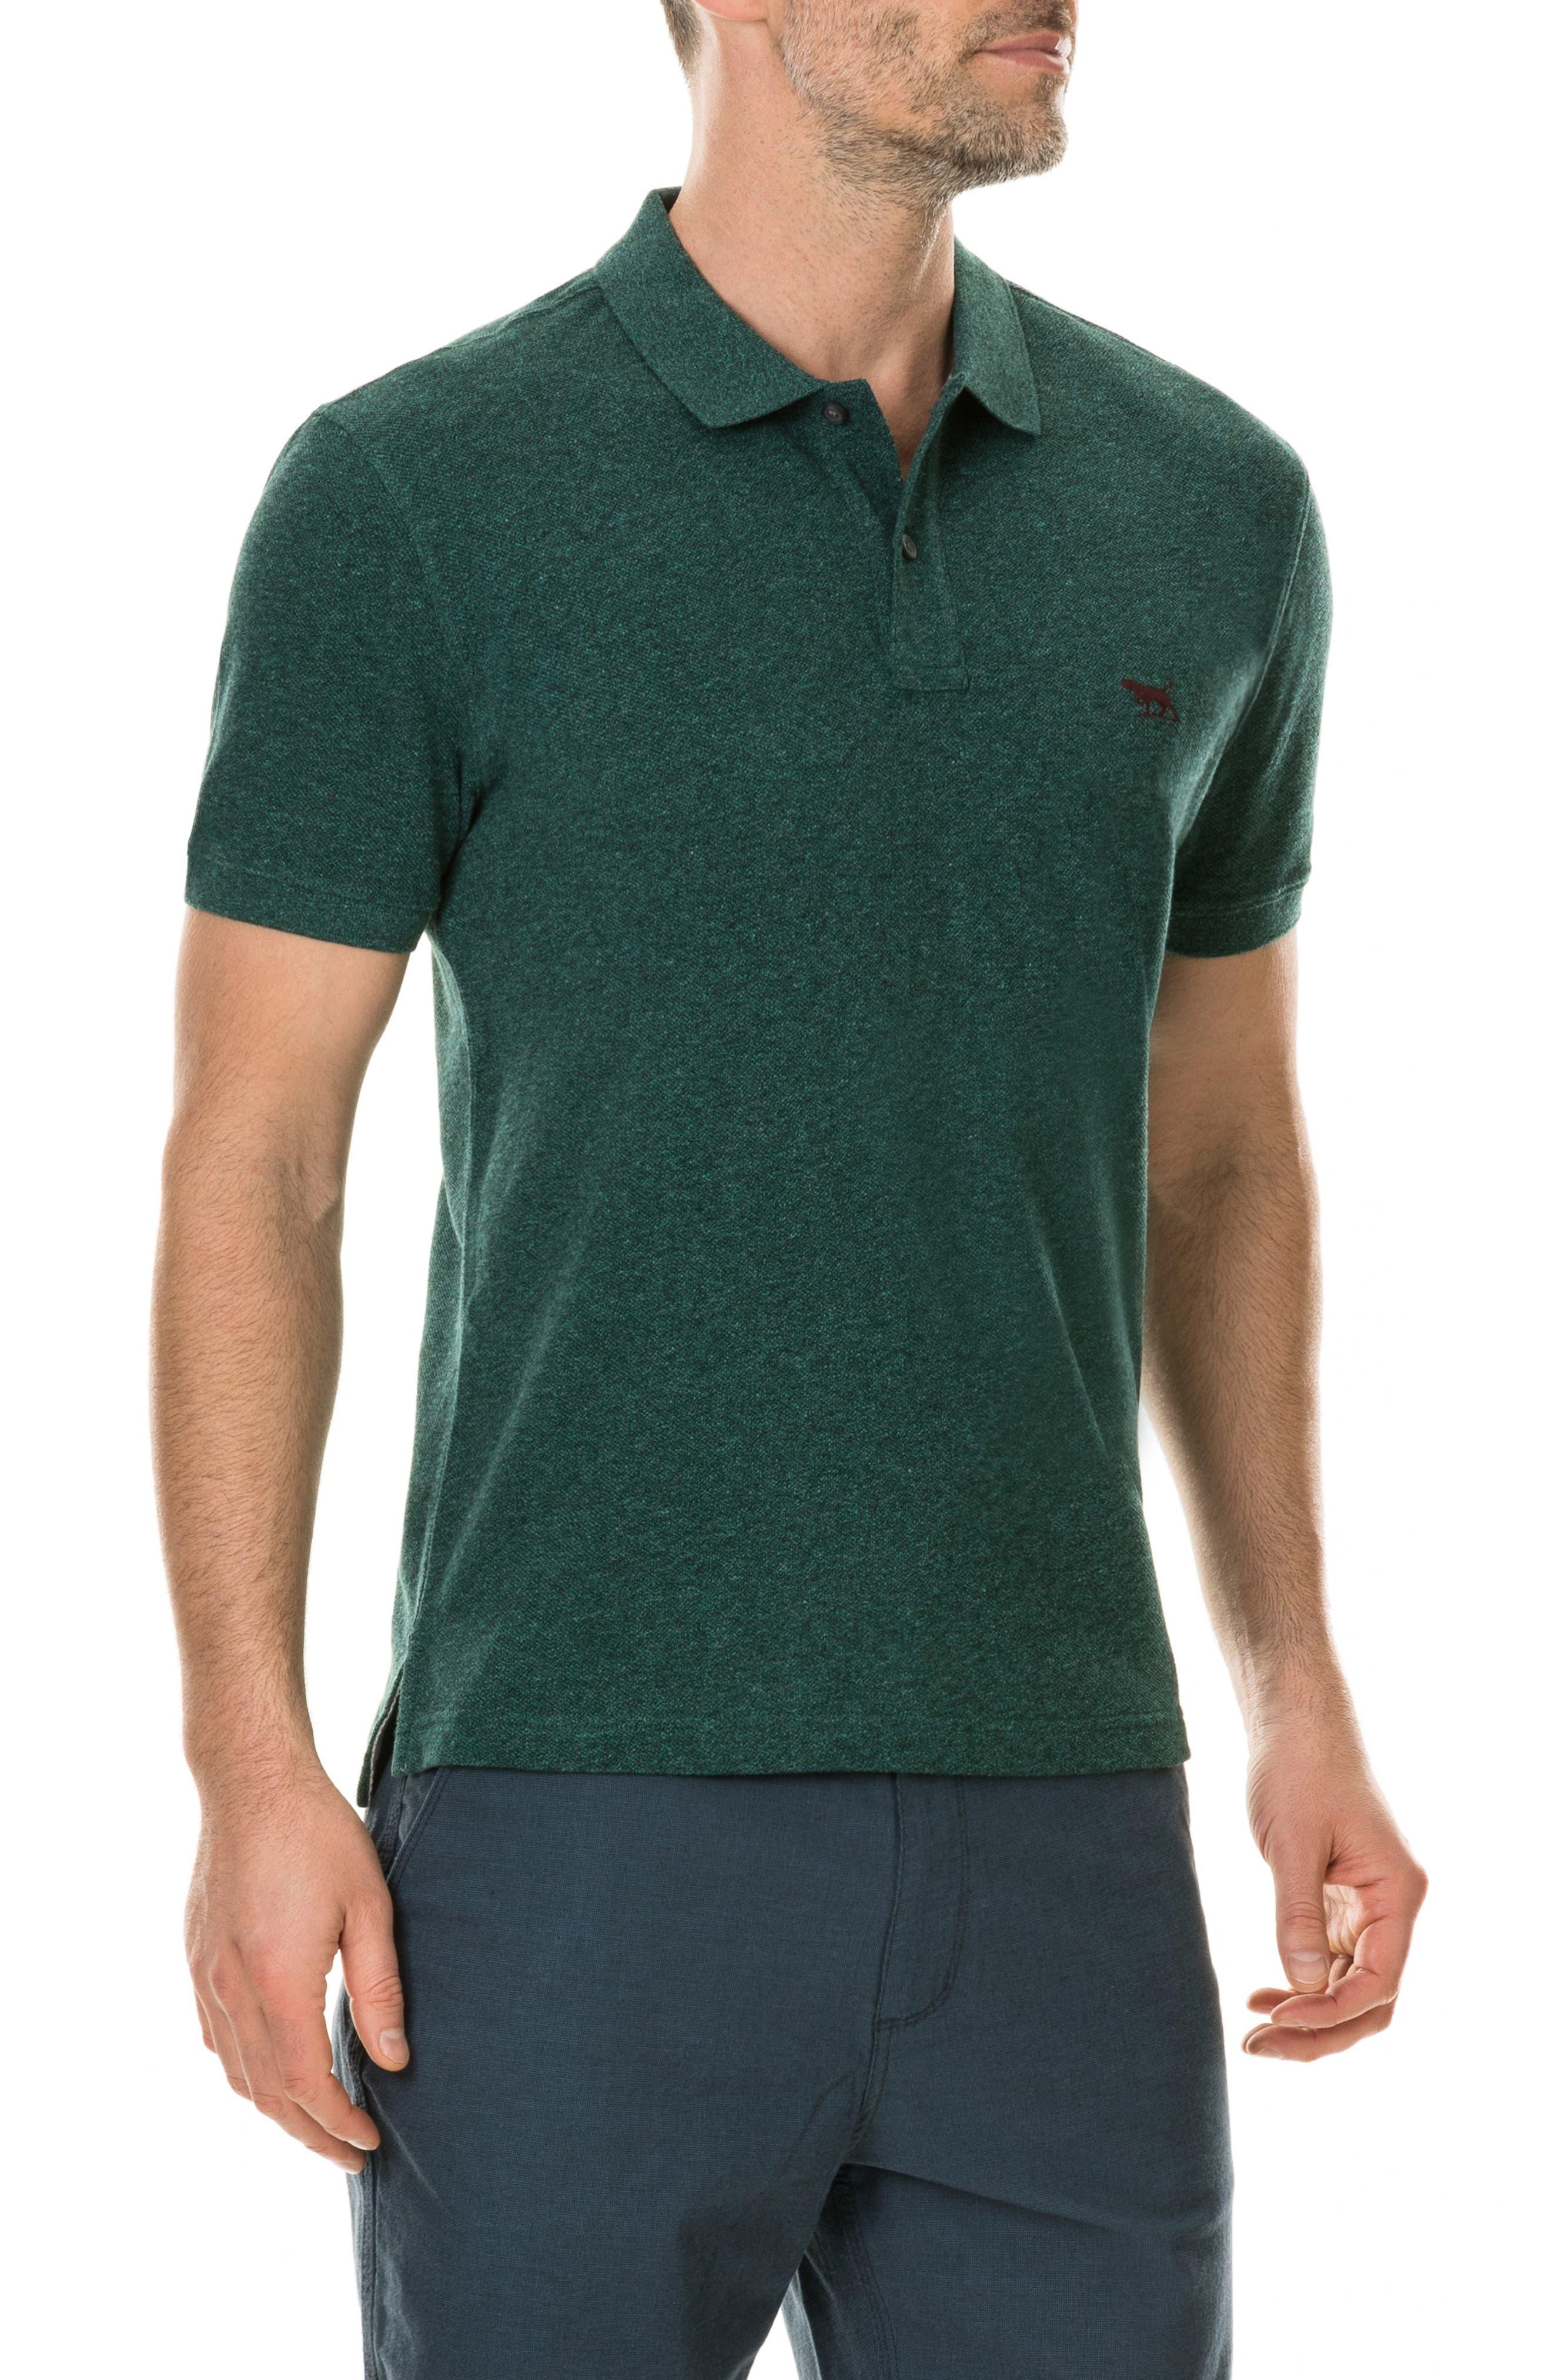 'The Gunn' Piqué Sports Fit Cotton Polo,                             Alternate thumbnail 3, color,                             PINE